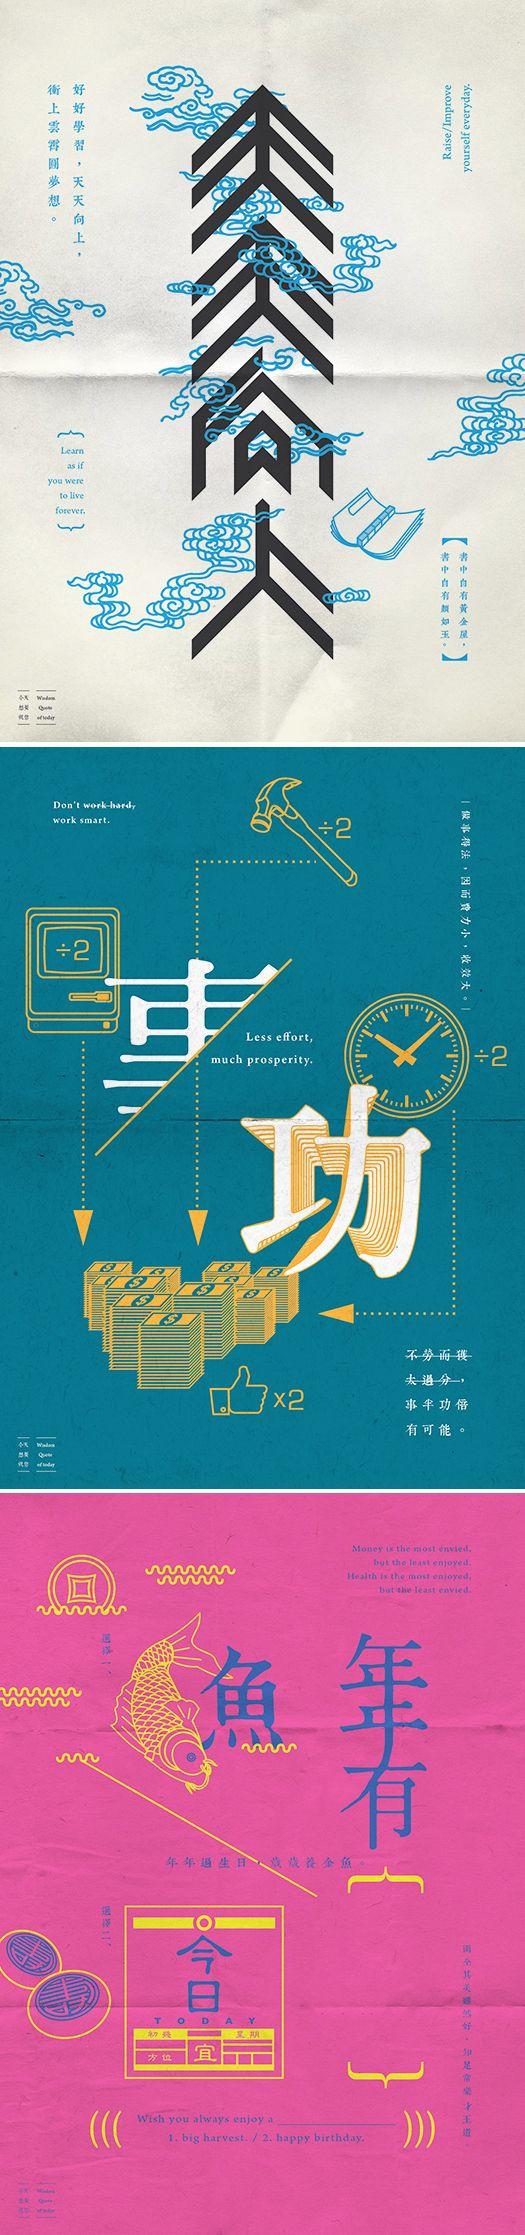 Chinese Saying | Tun Ho, 2013